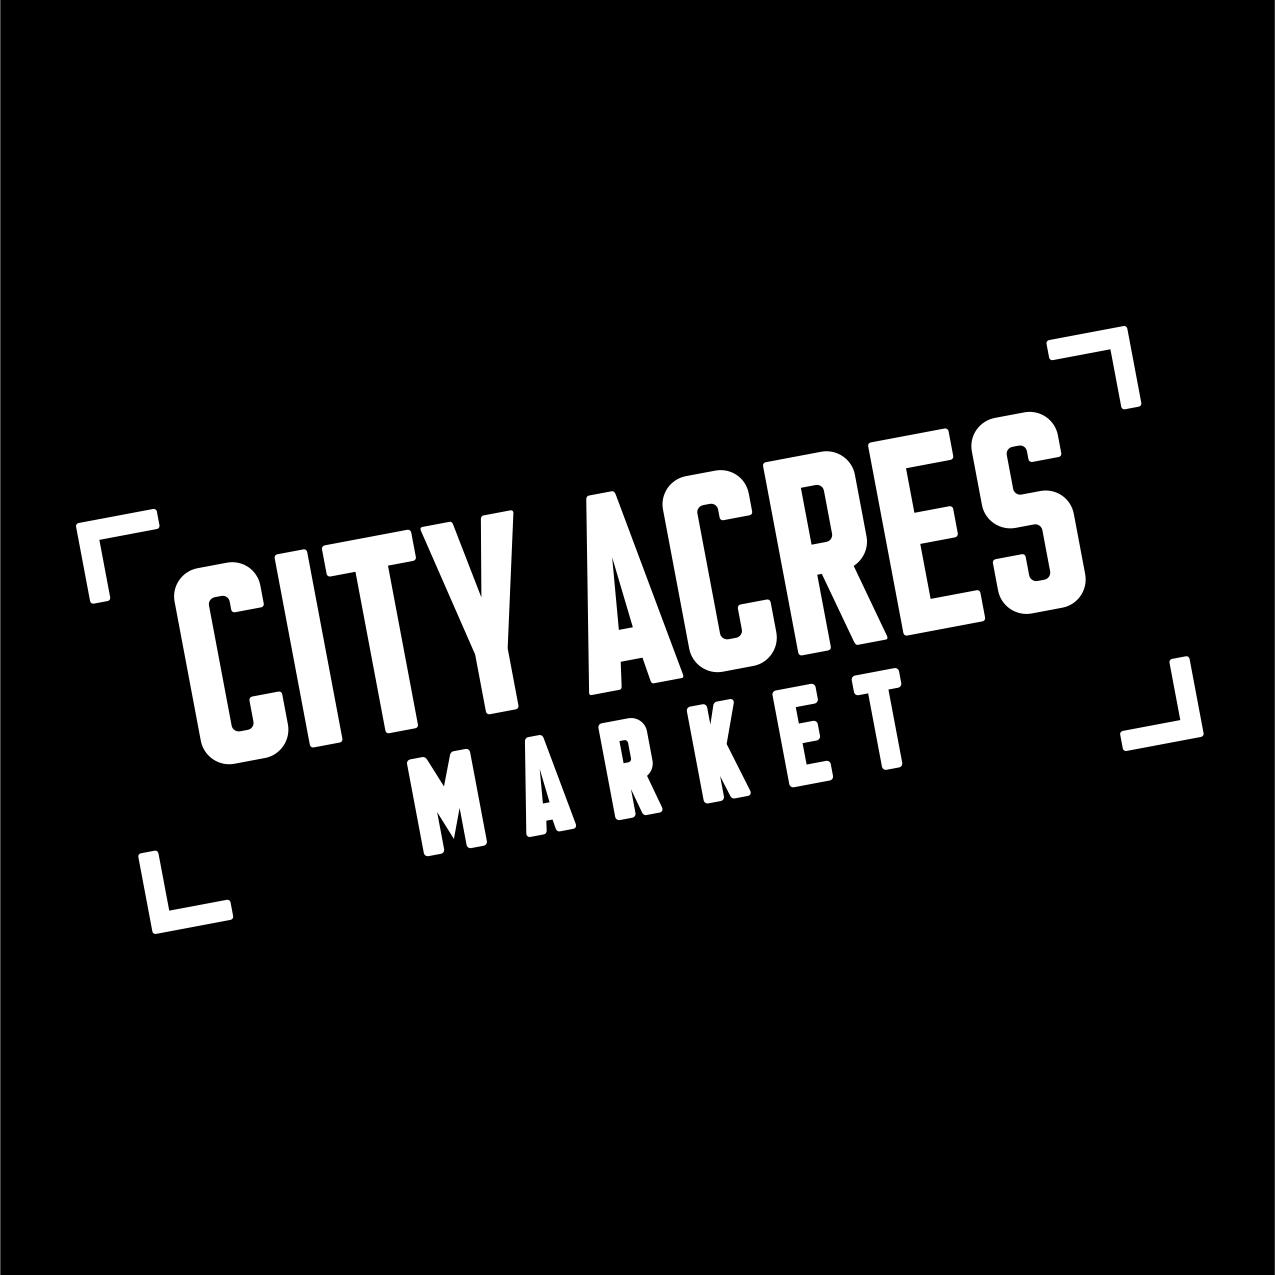 City Acres Market logo